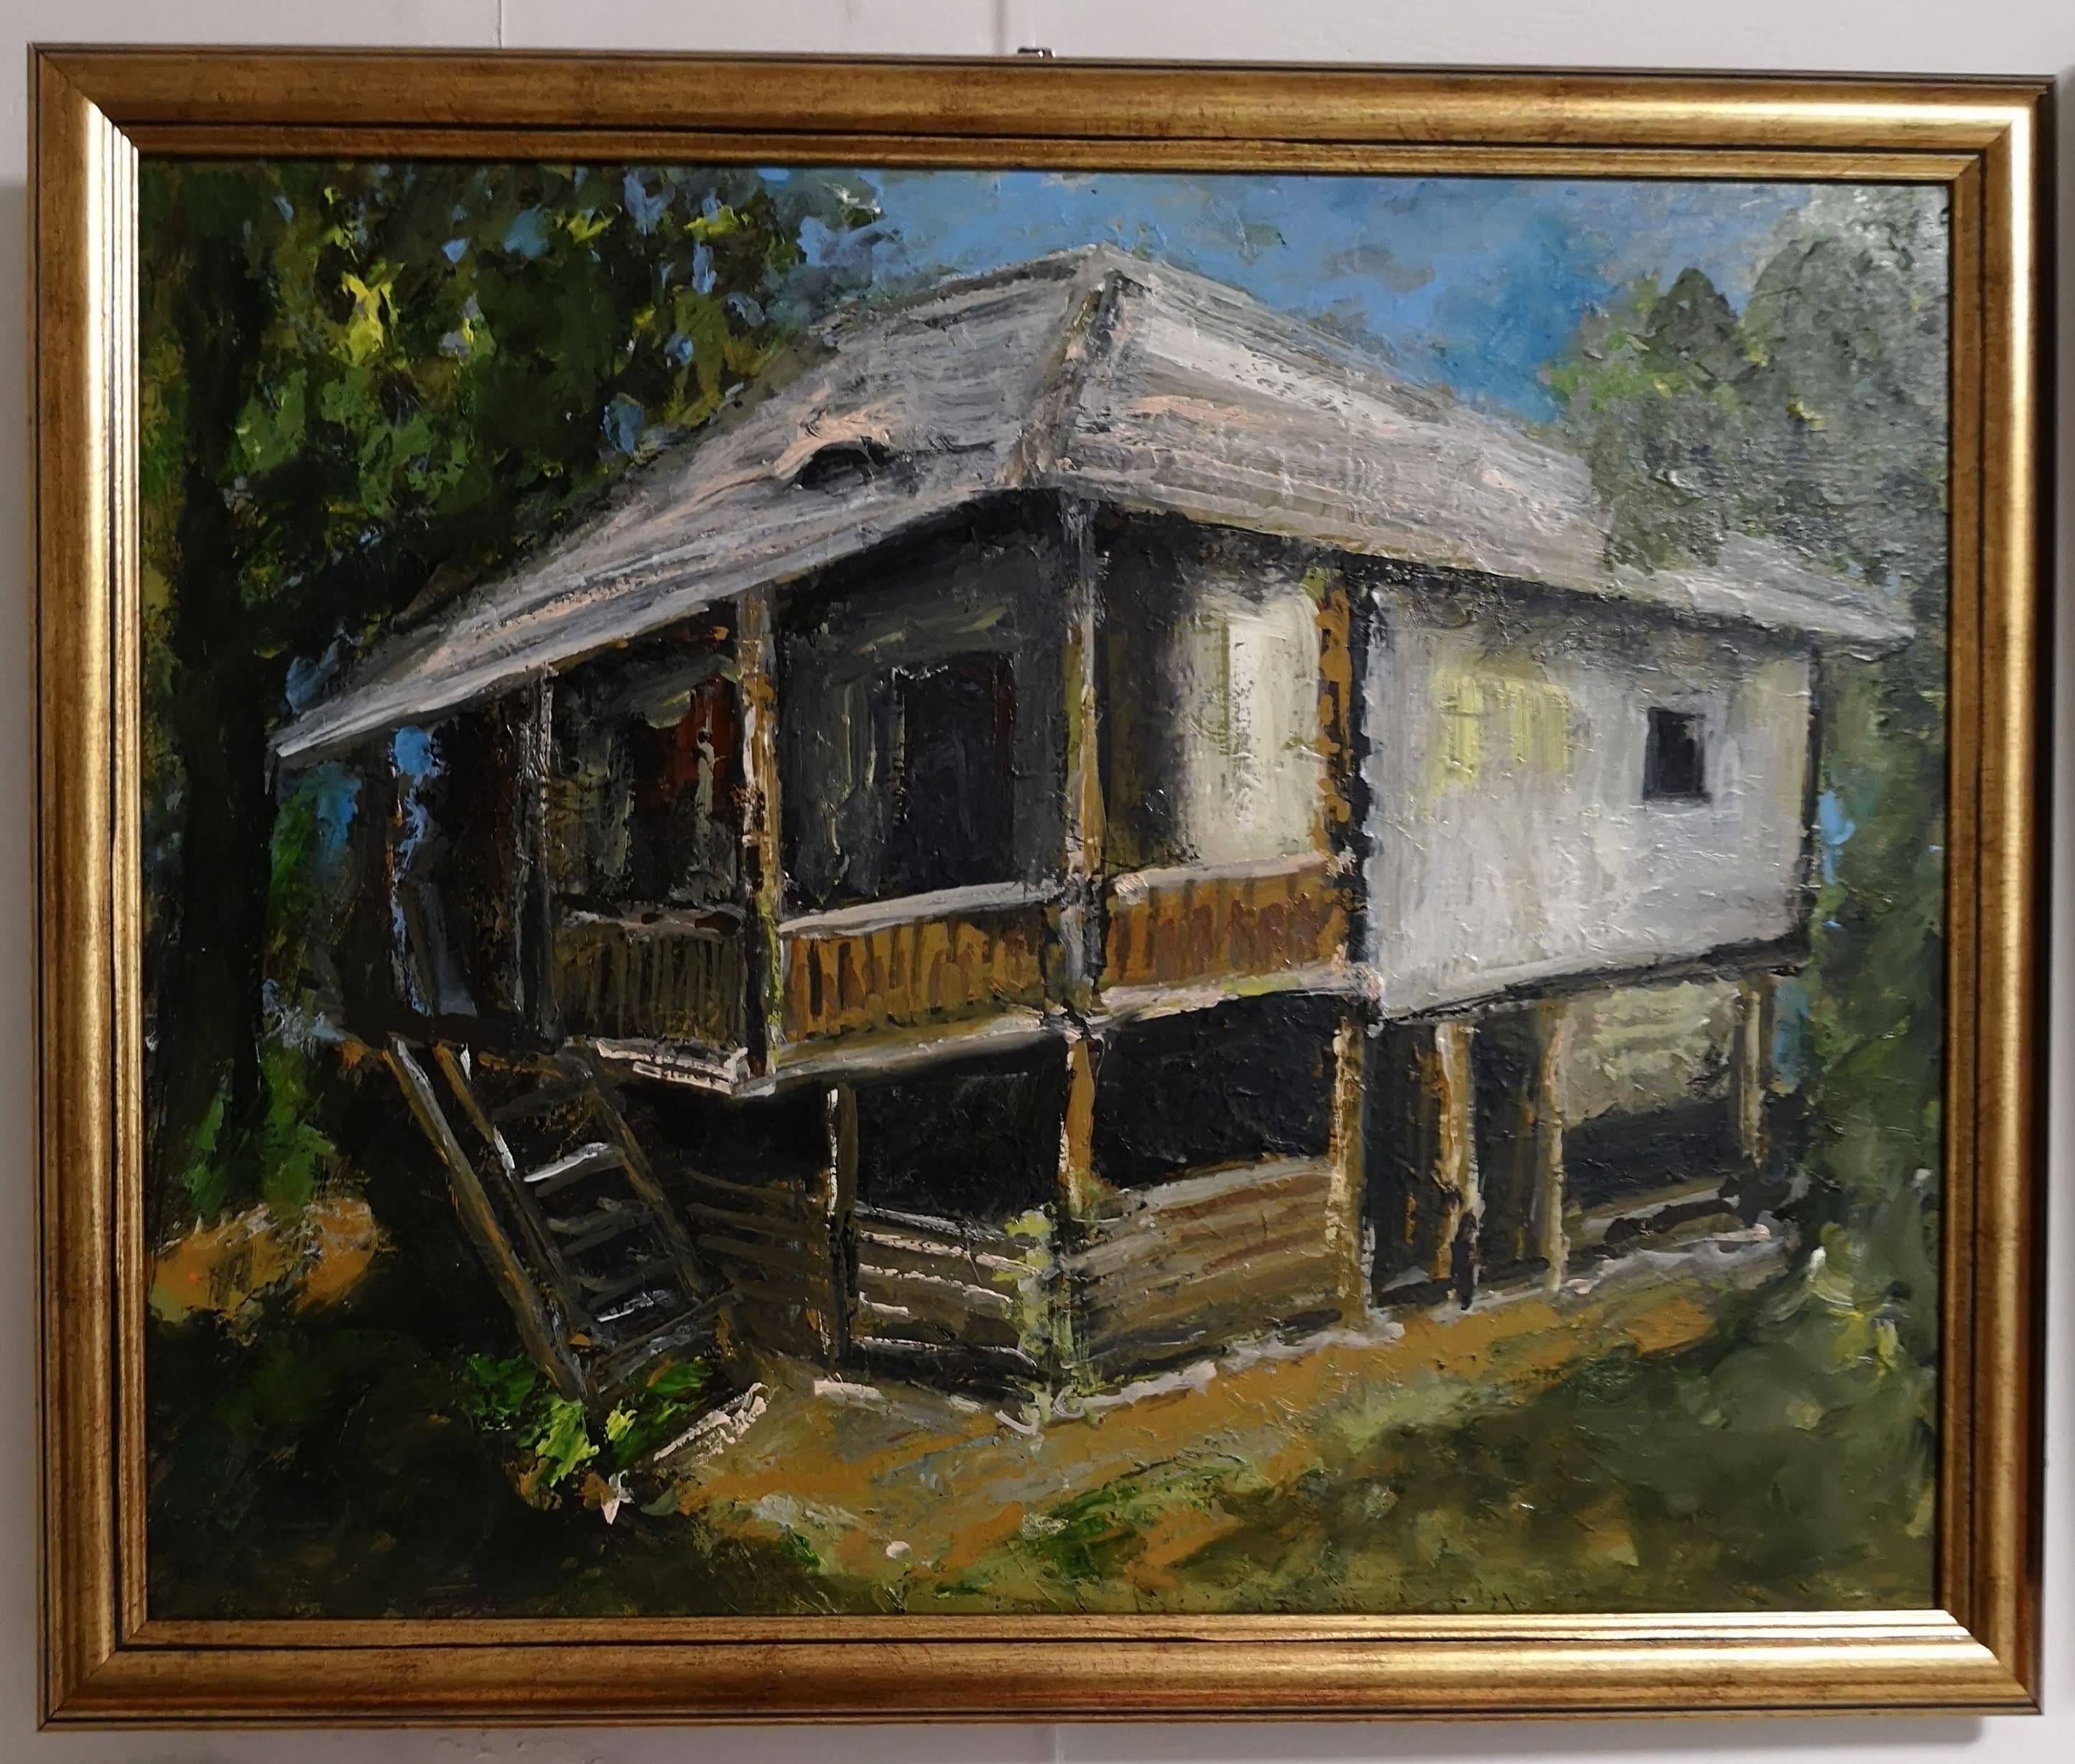 Casa-de-muzeu-u-pe-p-40x50-min